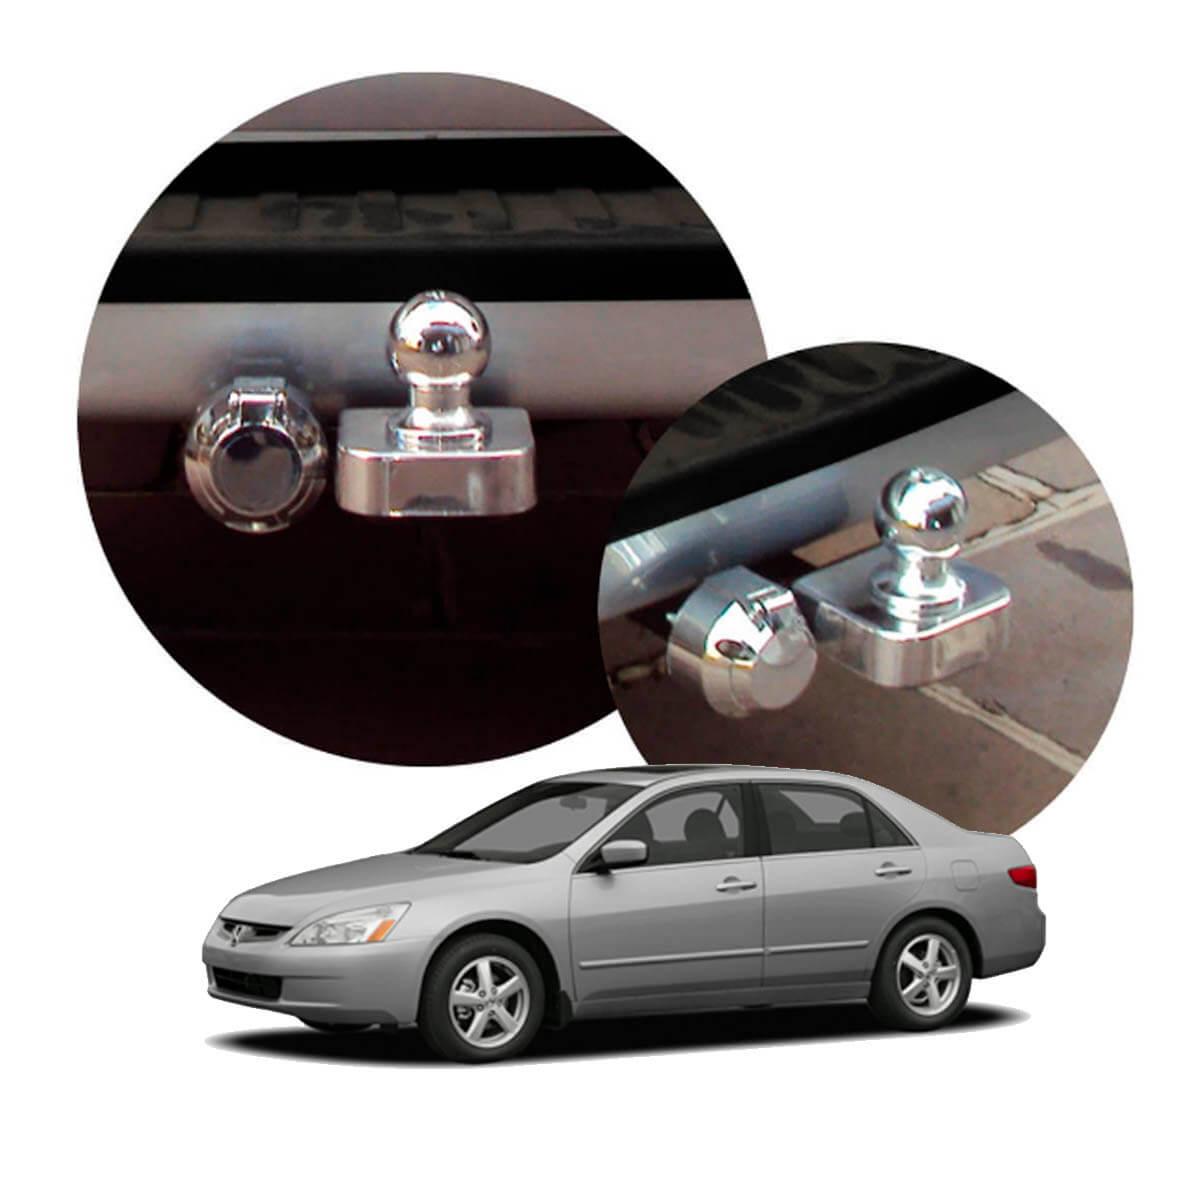 Engate de reboque fixo Civic 2004 a 2006